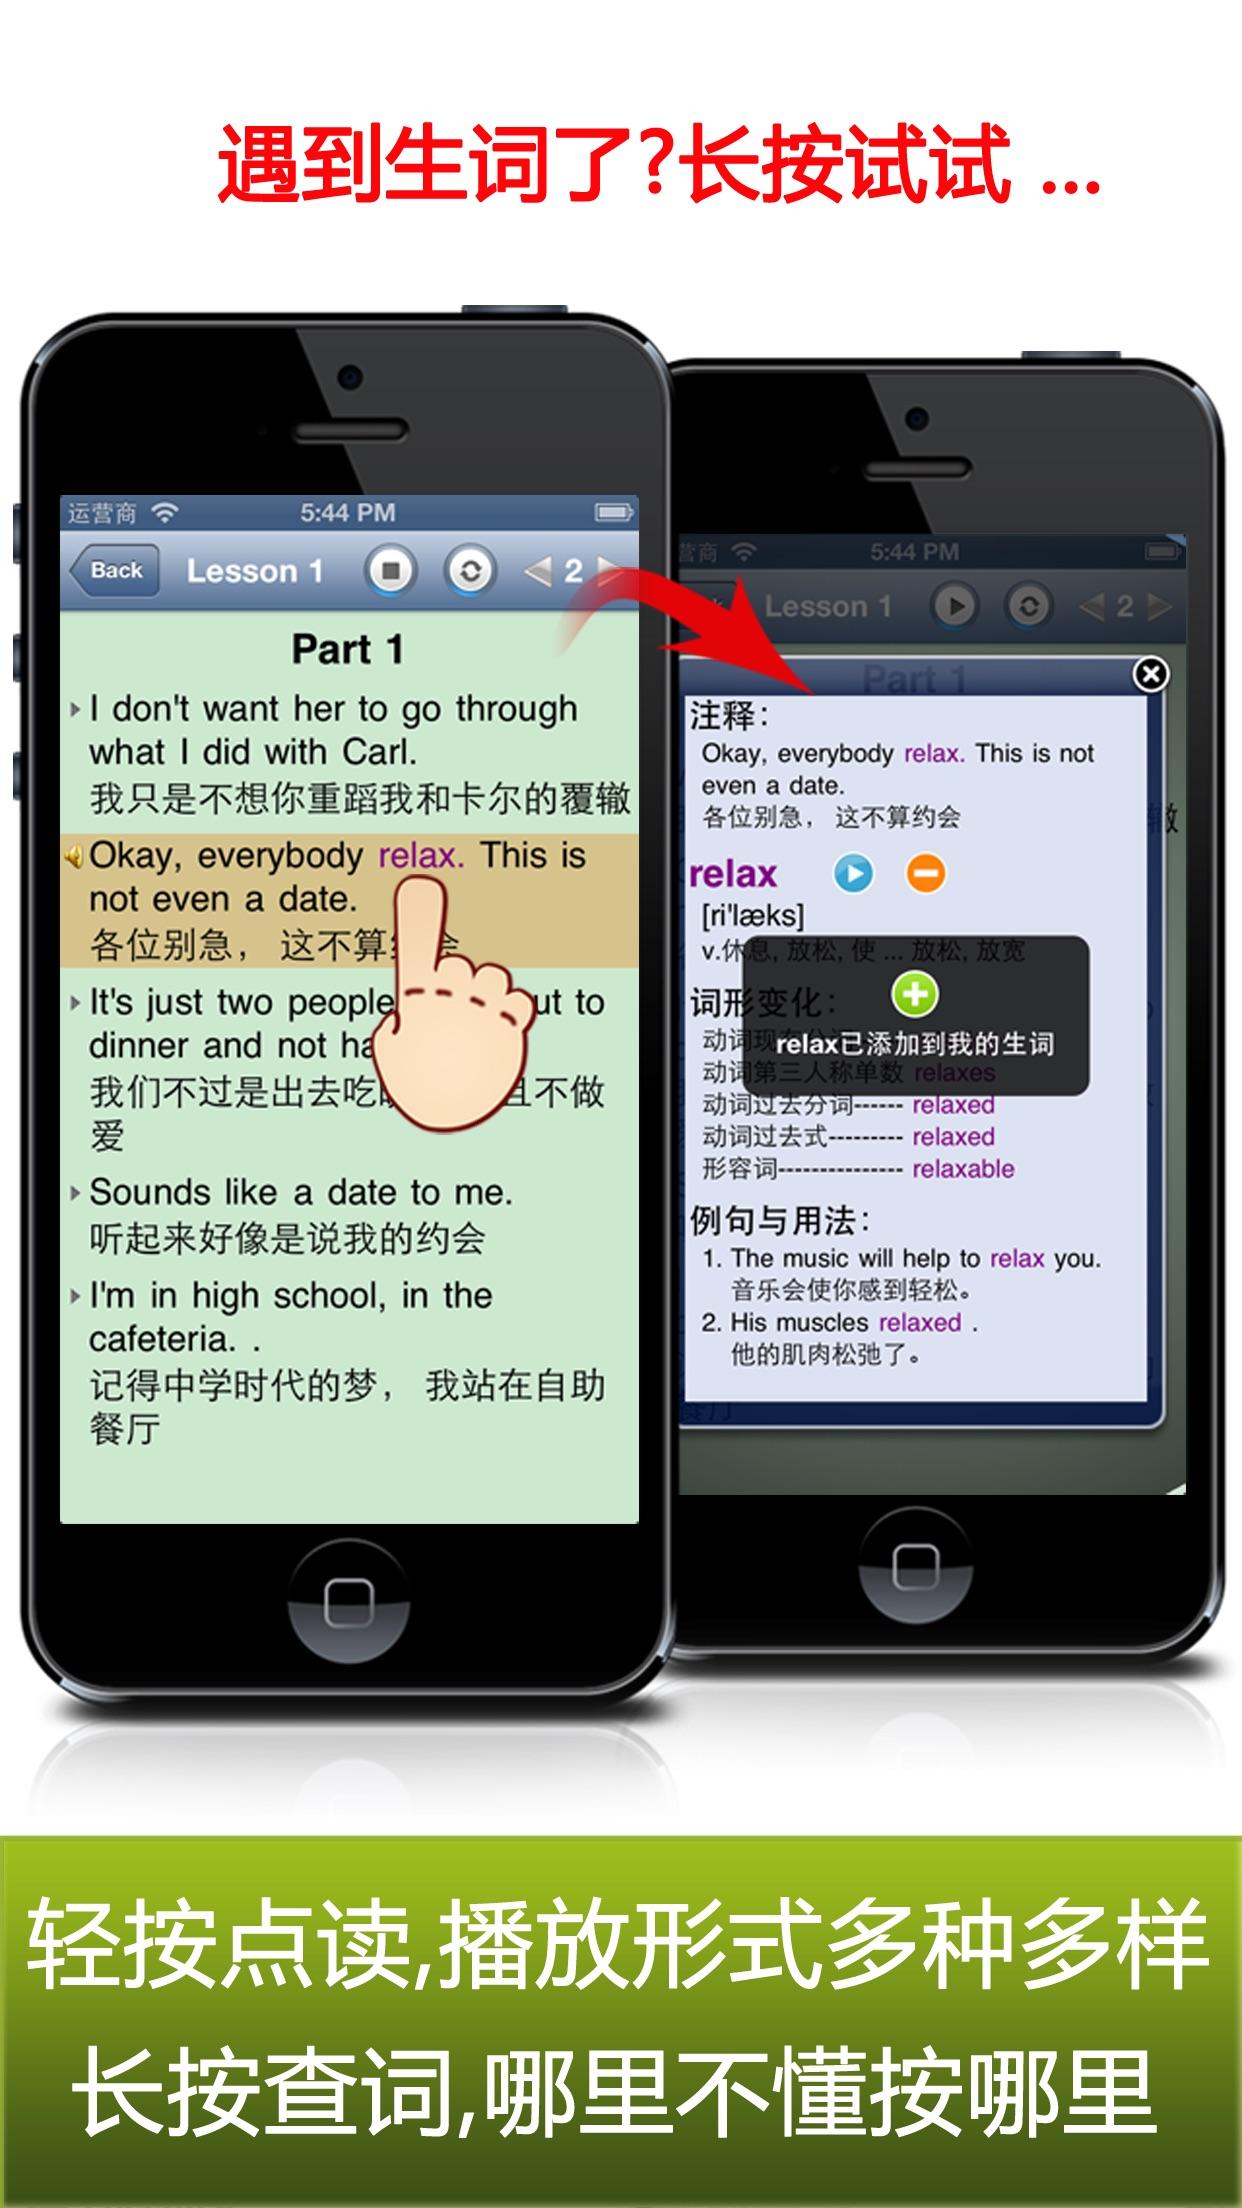 ESL learn English ebook - daily listening learning Screenshot